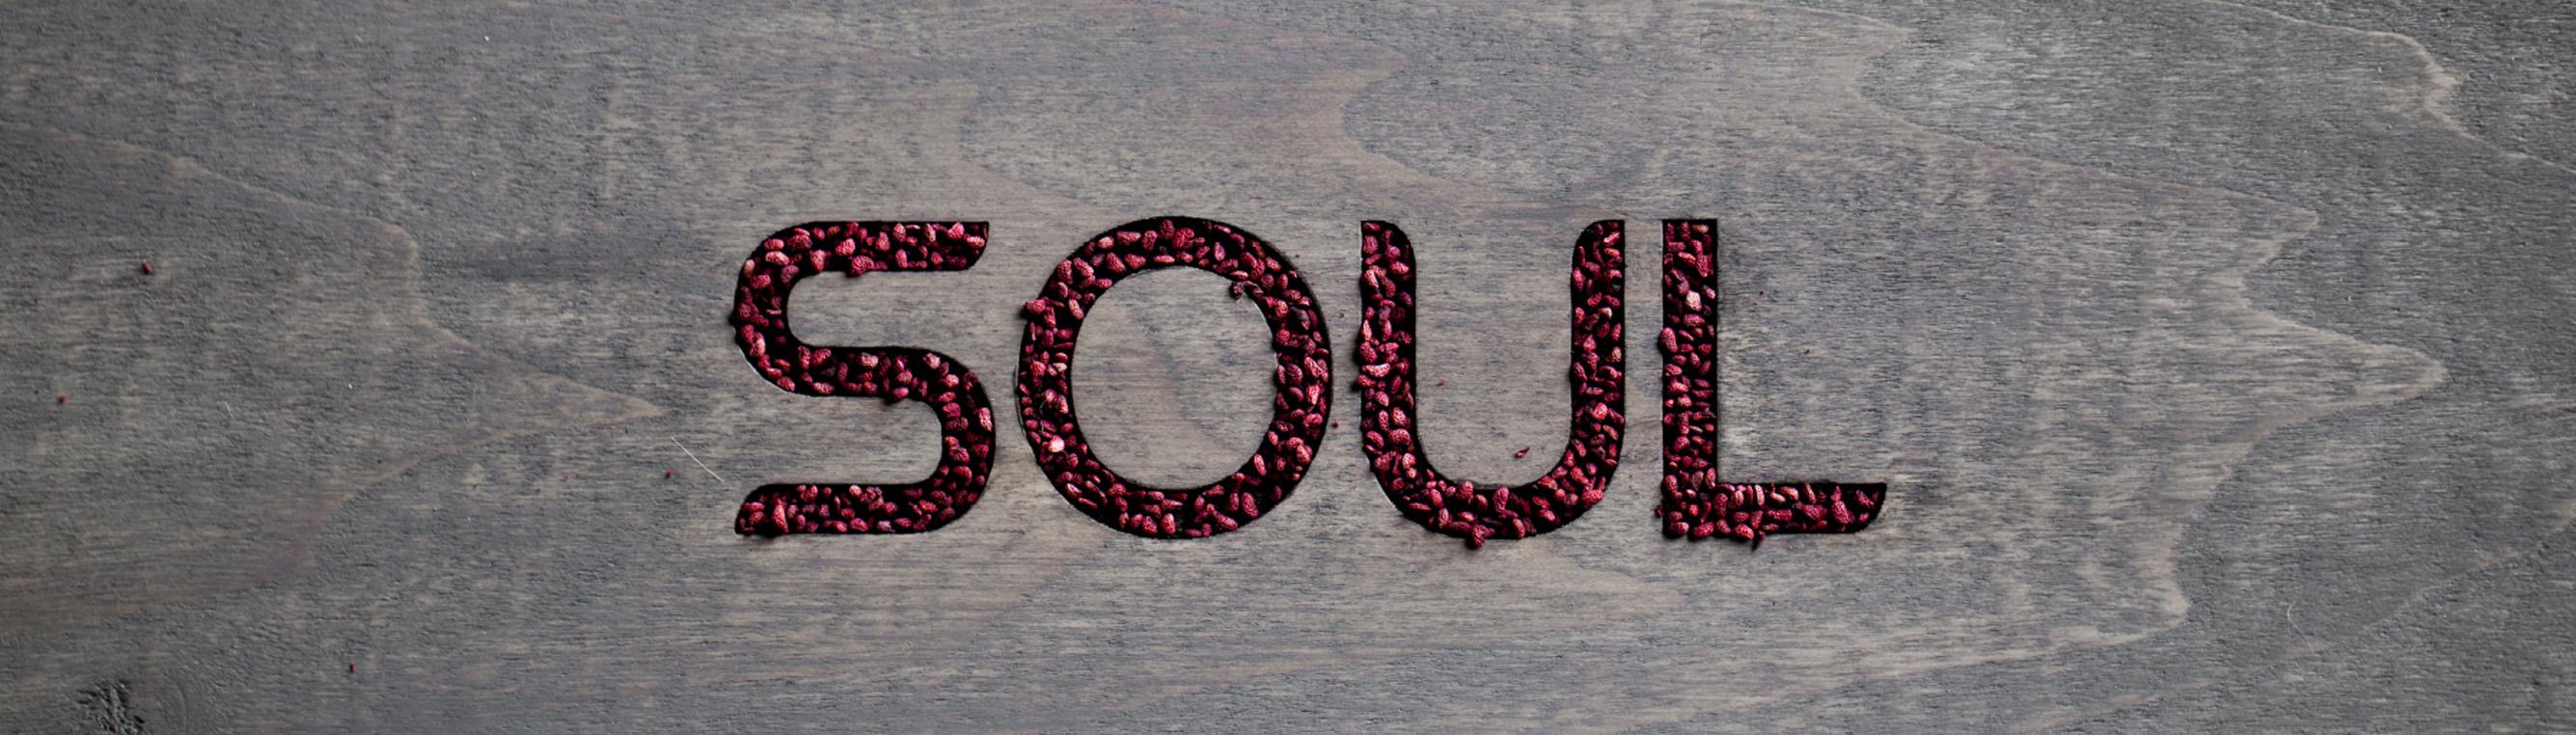 Rain international Soul Seed